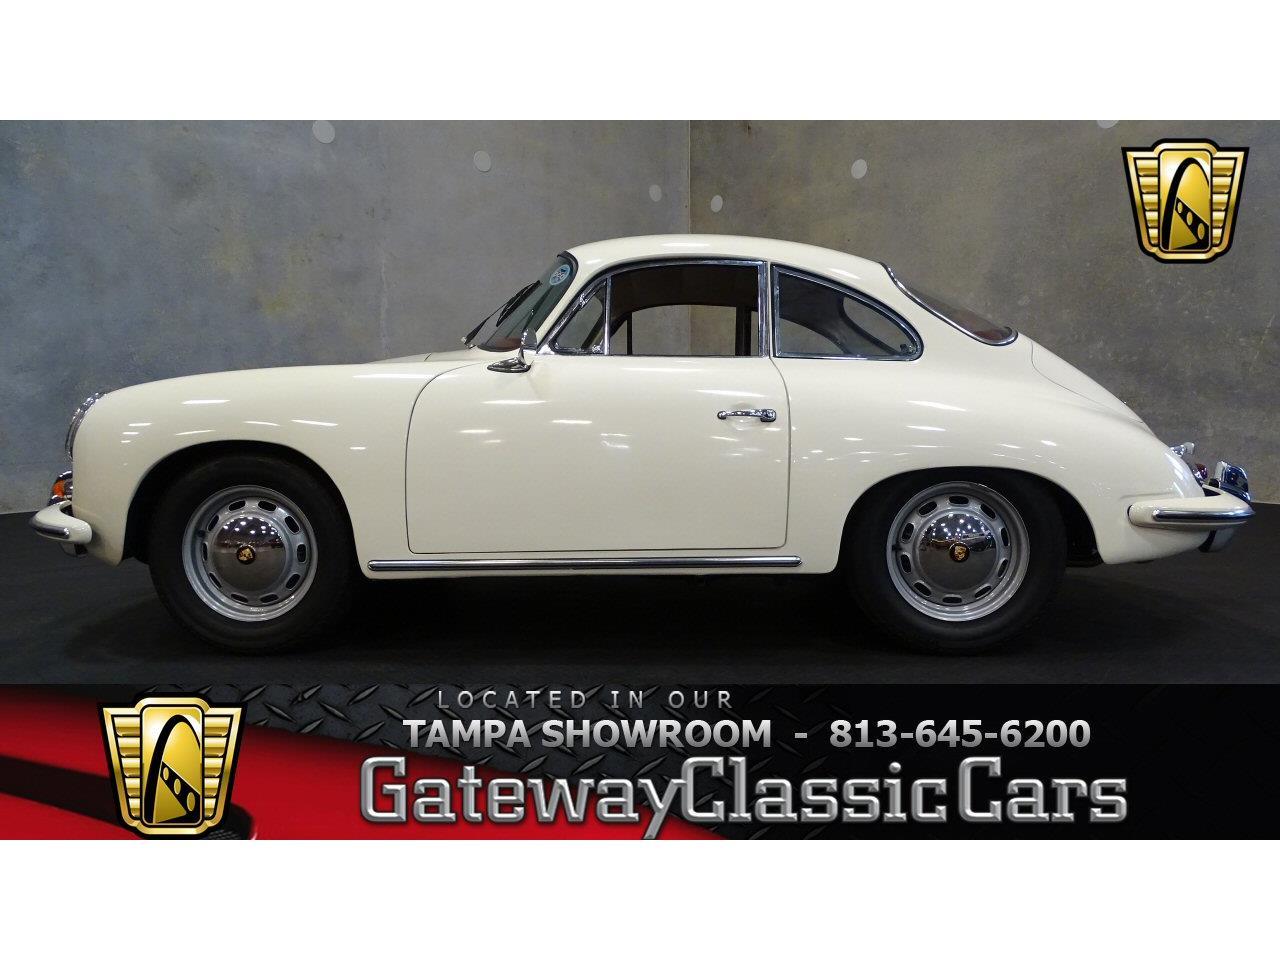 Porsche 356 For Sale >> For Sale 1964 Porsche 356 In O Fallon Illinois